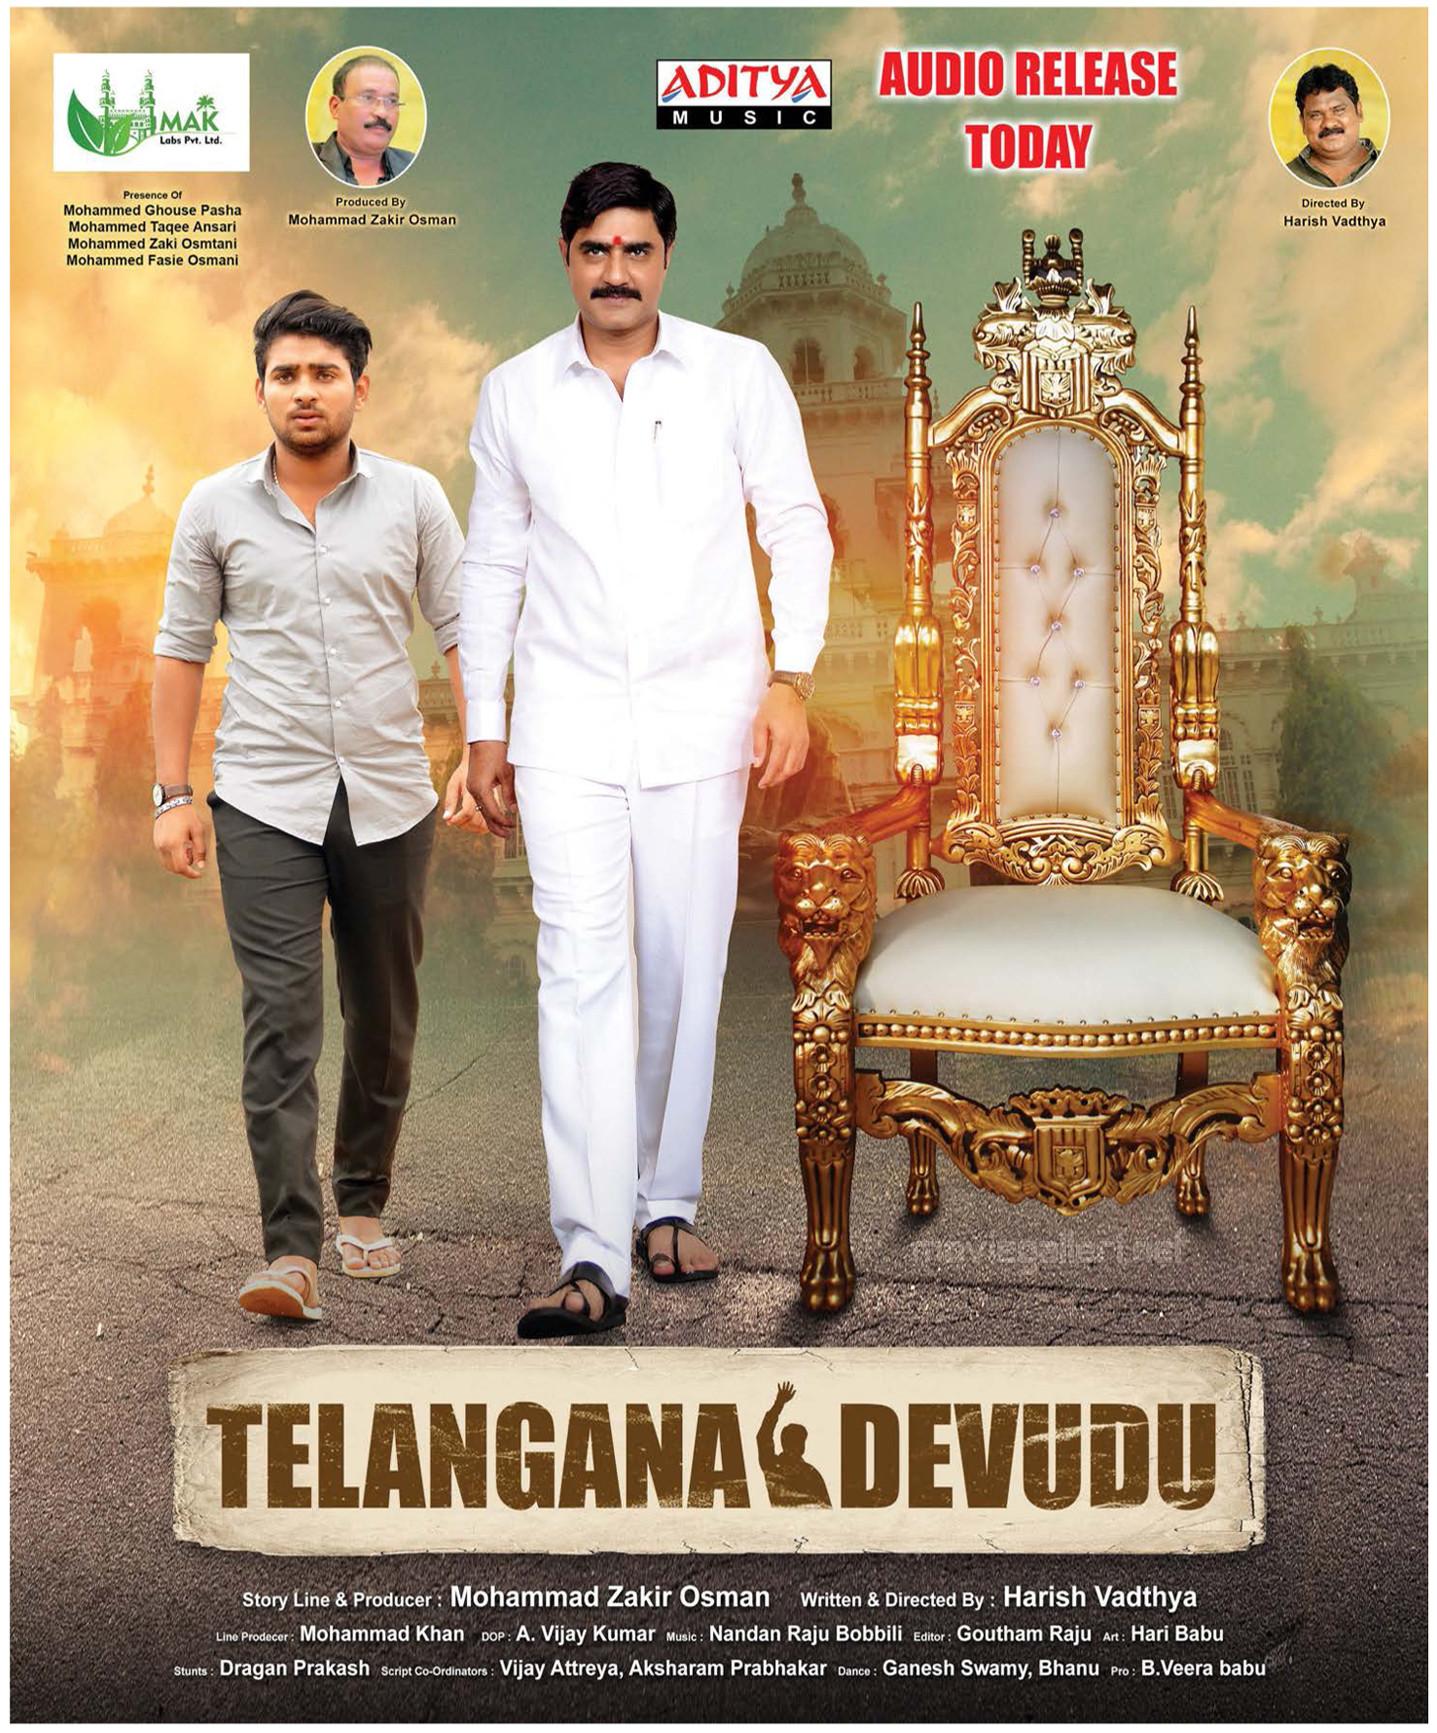 Srikanth Telangana Devudu Movie Audio Release Today Posters